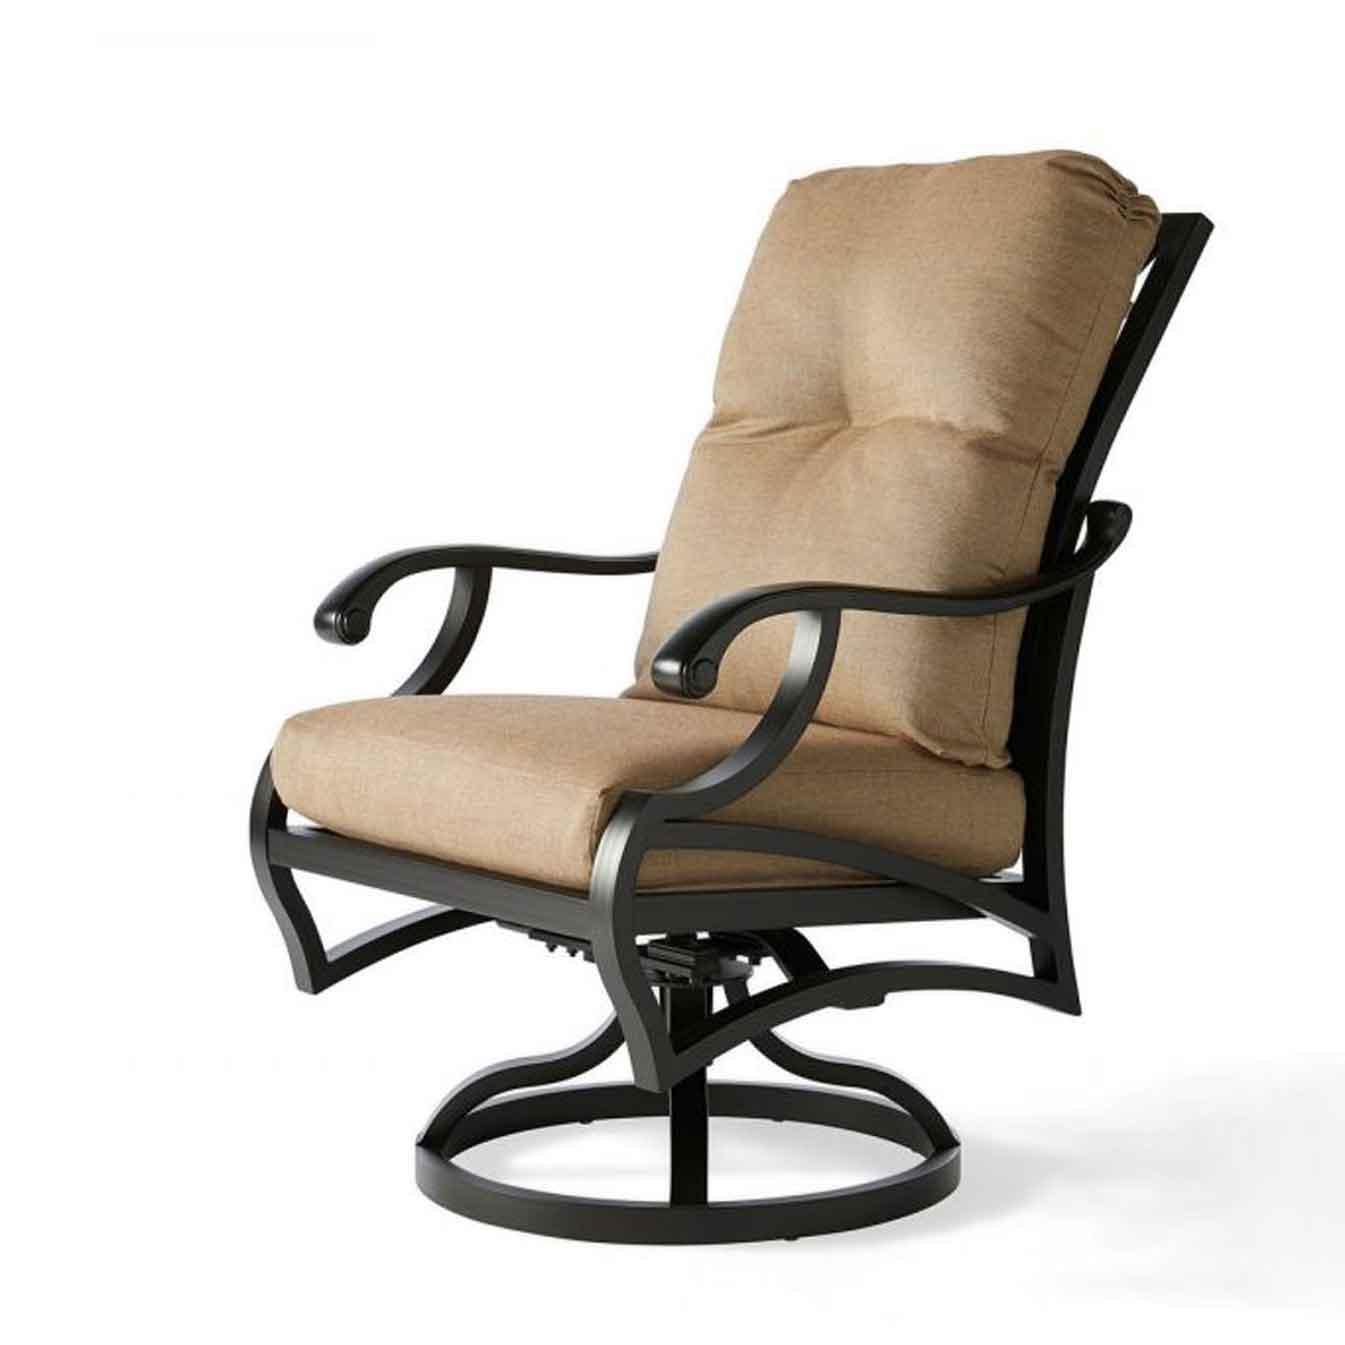 Volare Cushion Swivel Dining Chair - Rochelle Pebble